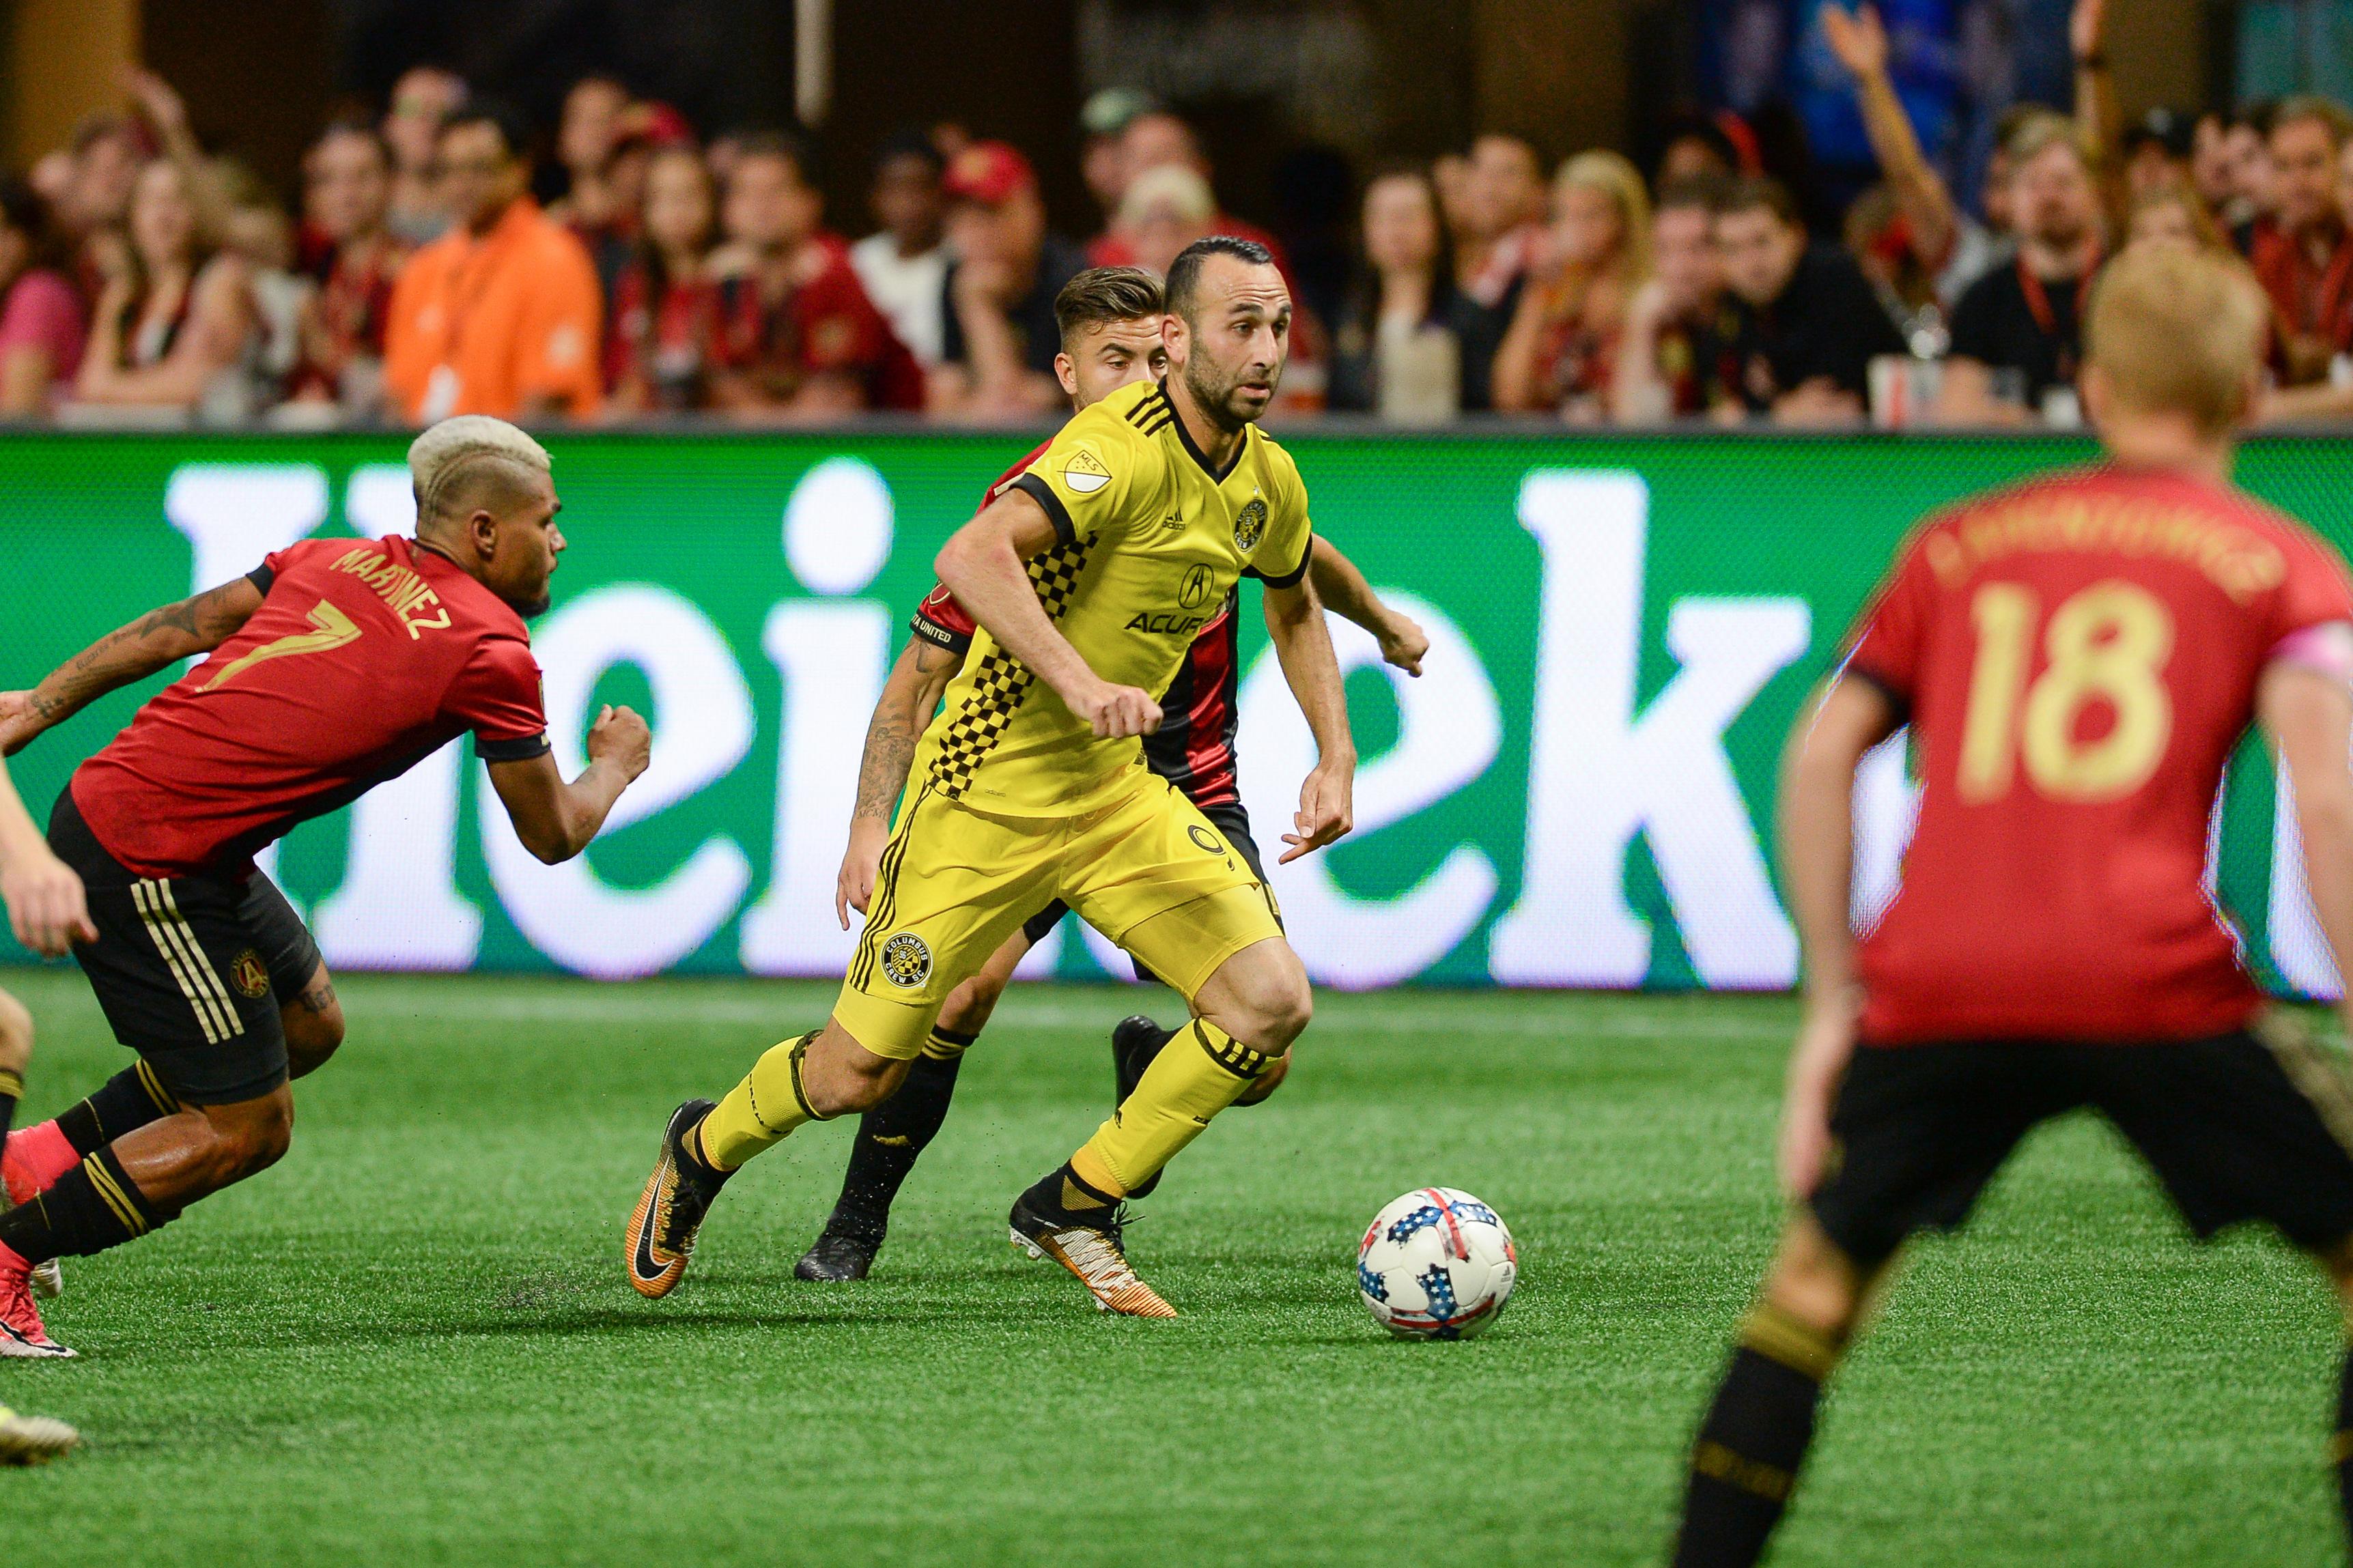 SOCCER: OCT 26 MLS Cup Playoffs - Columbus Crew at Atlanta United